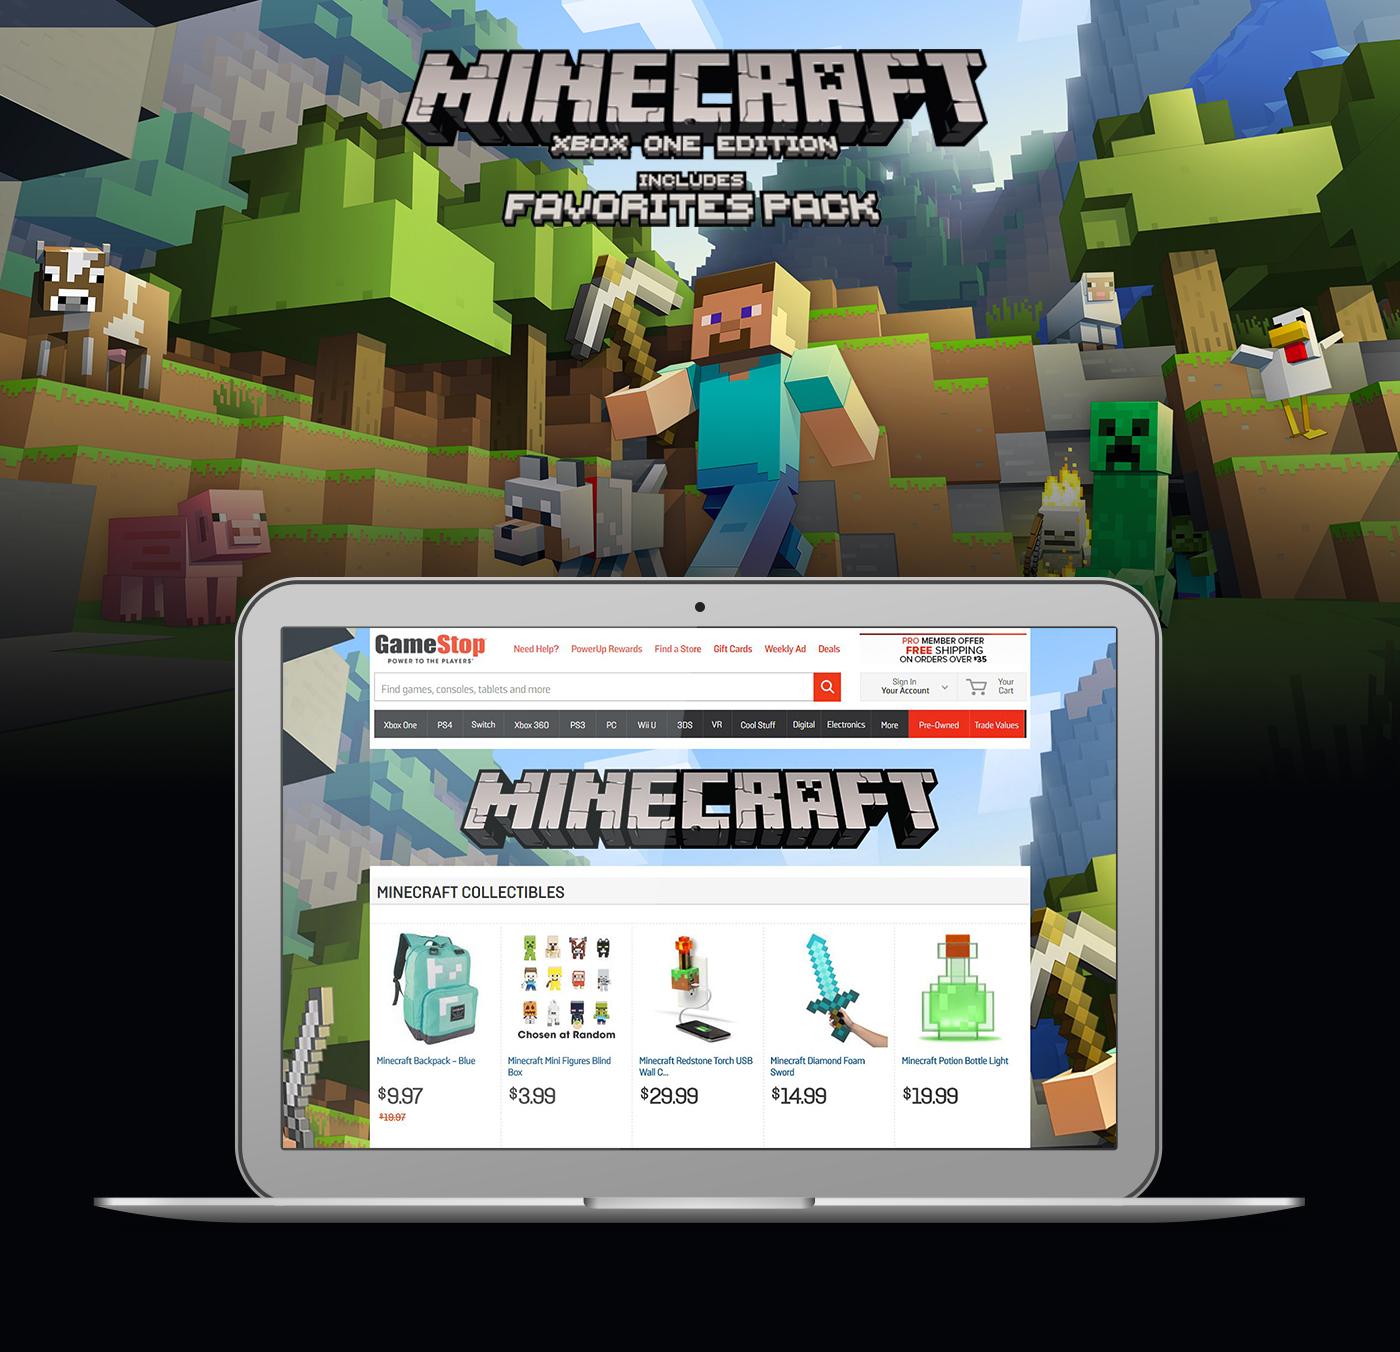 XboxOne_Minecraft.jpg